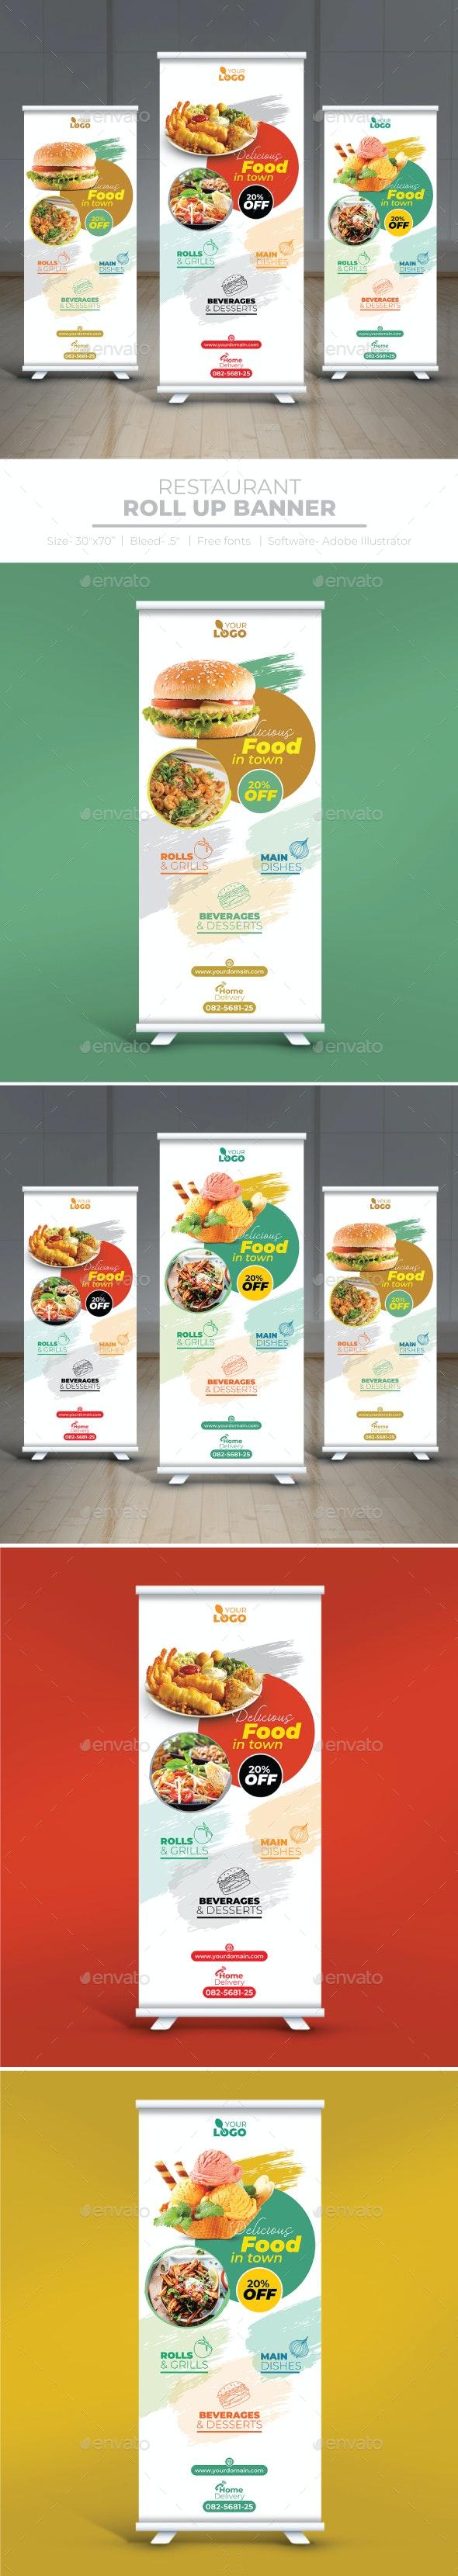 Restaurant Roll Up Banner - Signage Print Templates